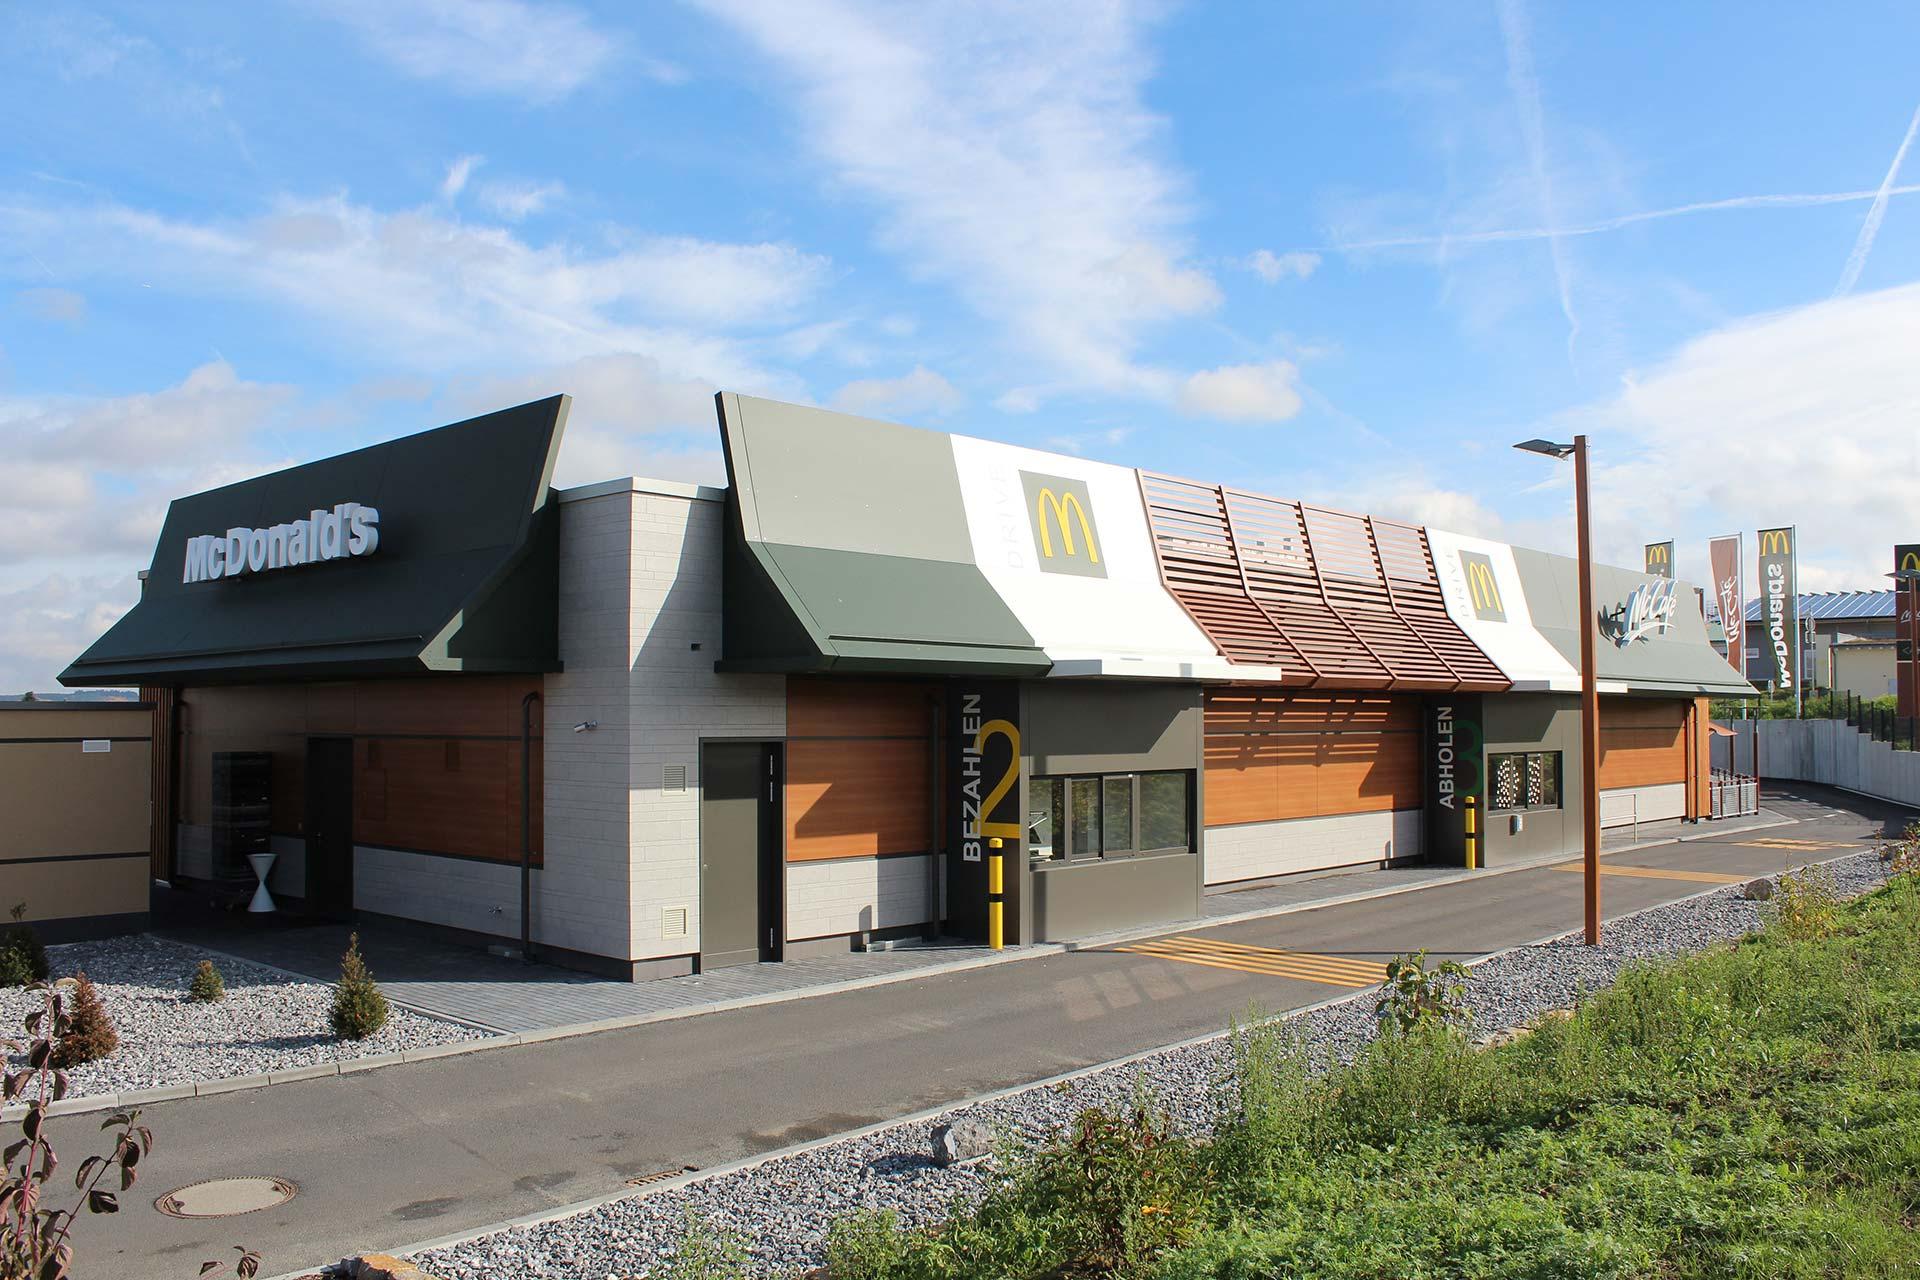 Projekte: Neubau McDonald's-Restaurants Standard-Design - Neubau McDonald's Restaurant Neu-Anspach